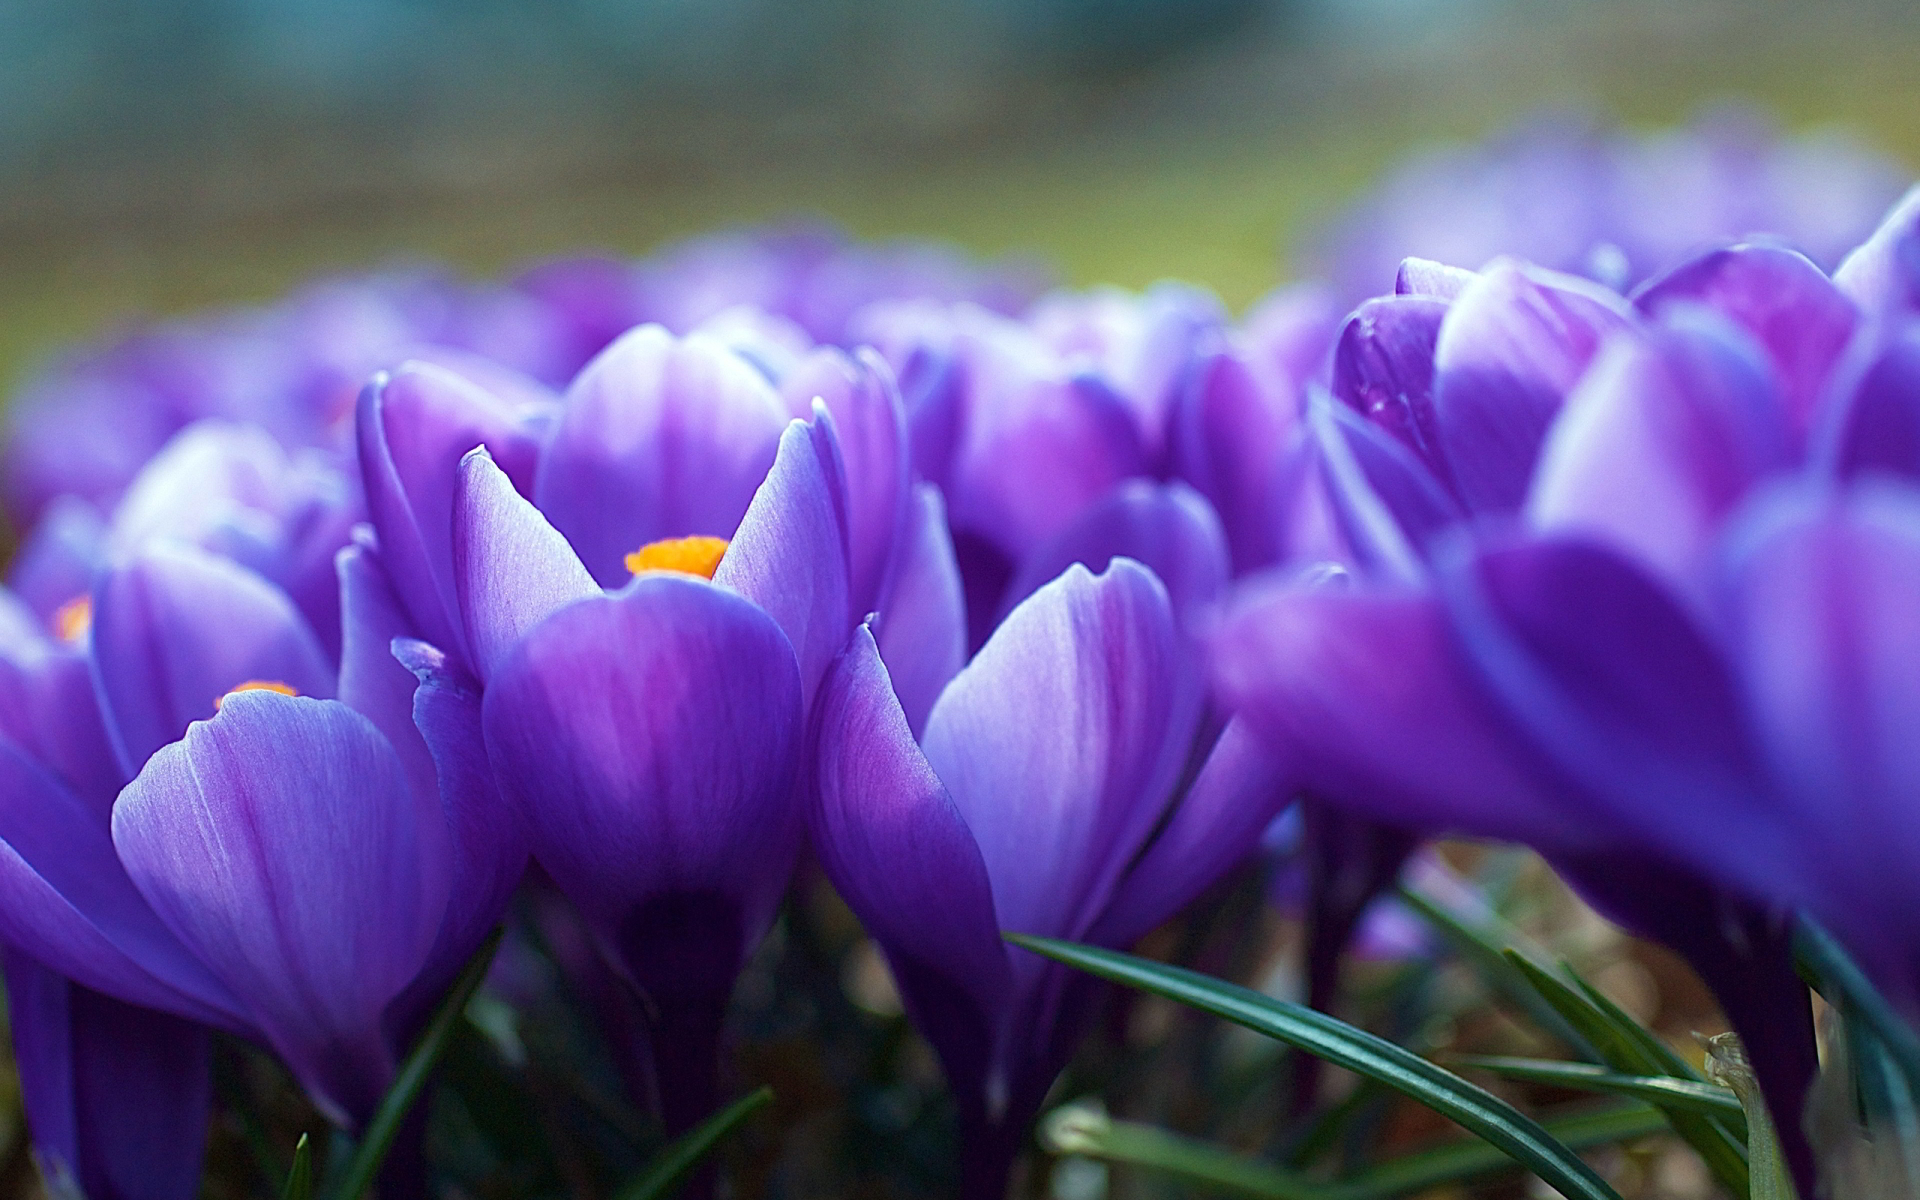 3d Lotus Live Wallpaper Crocus Flower Purple Hd Desktop Wallpapers 4k Hd